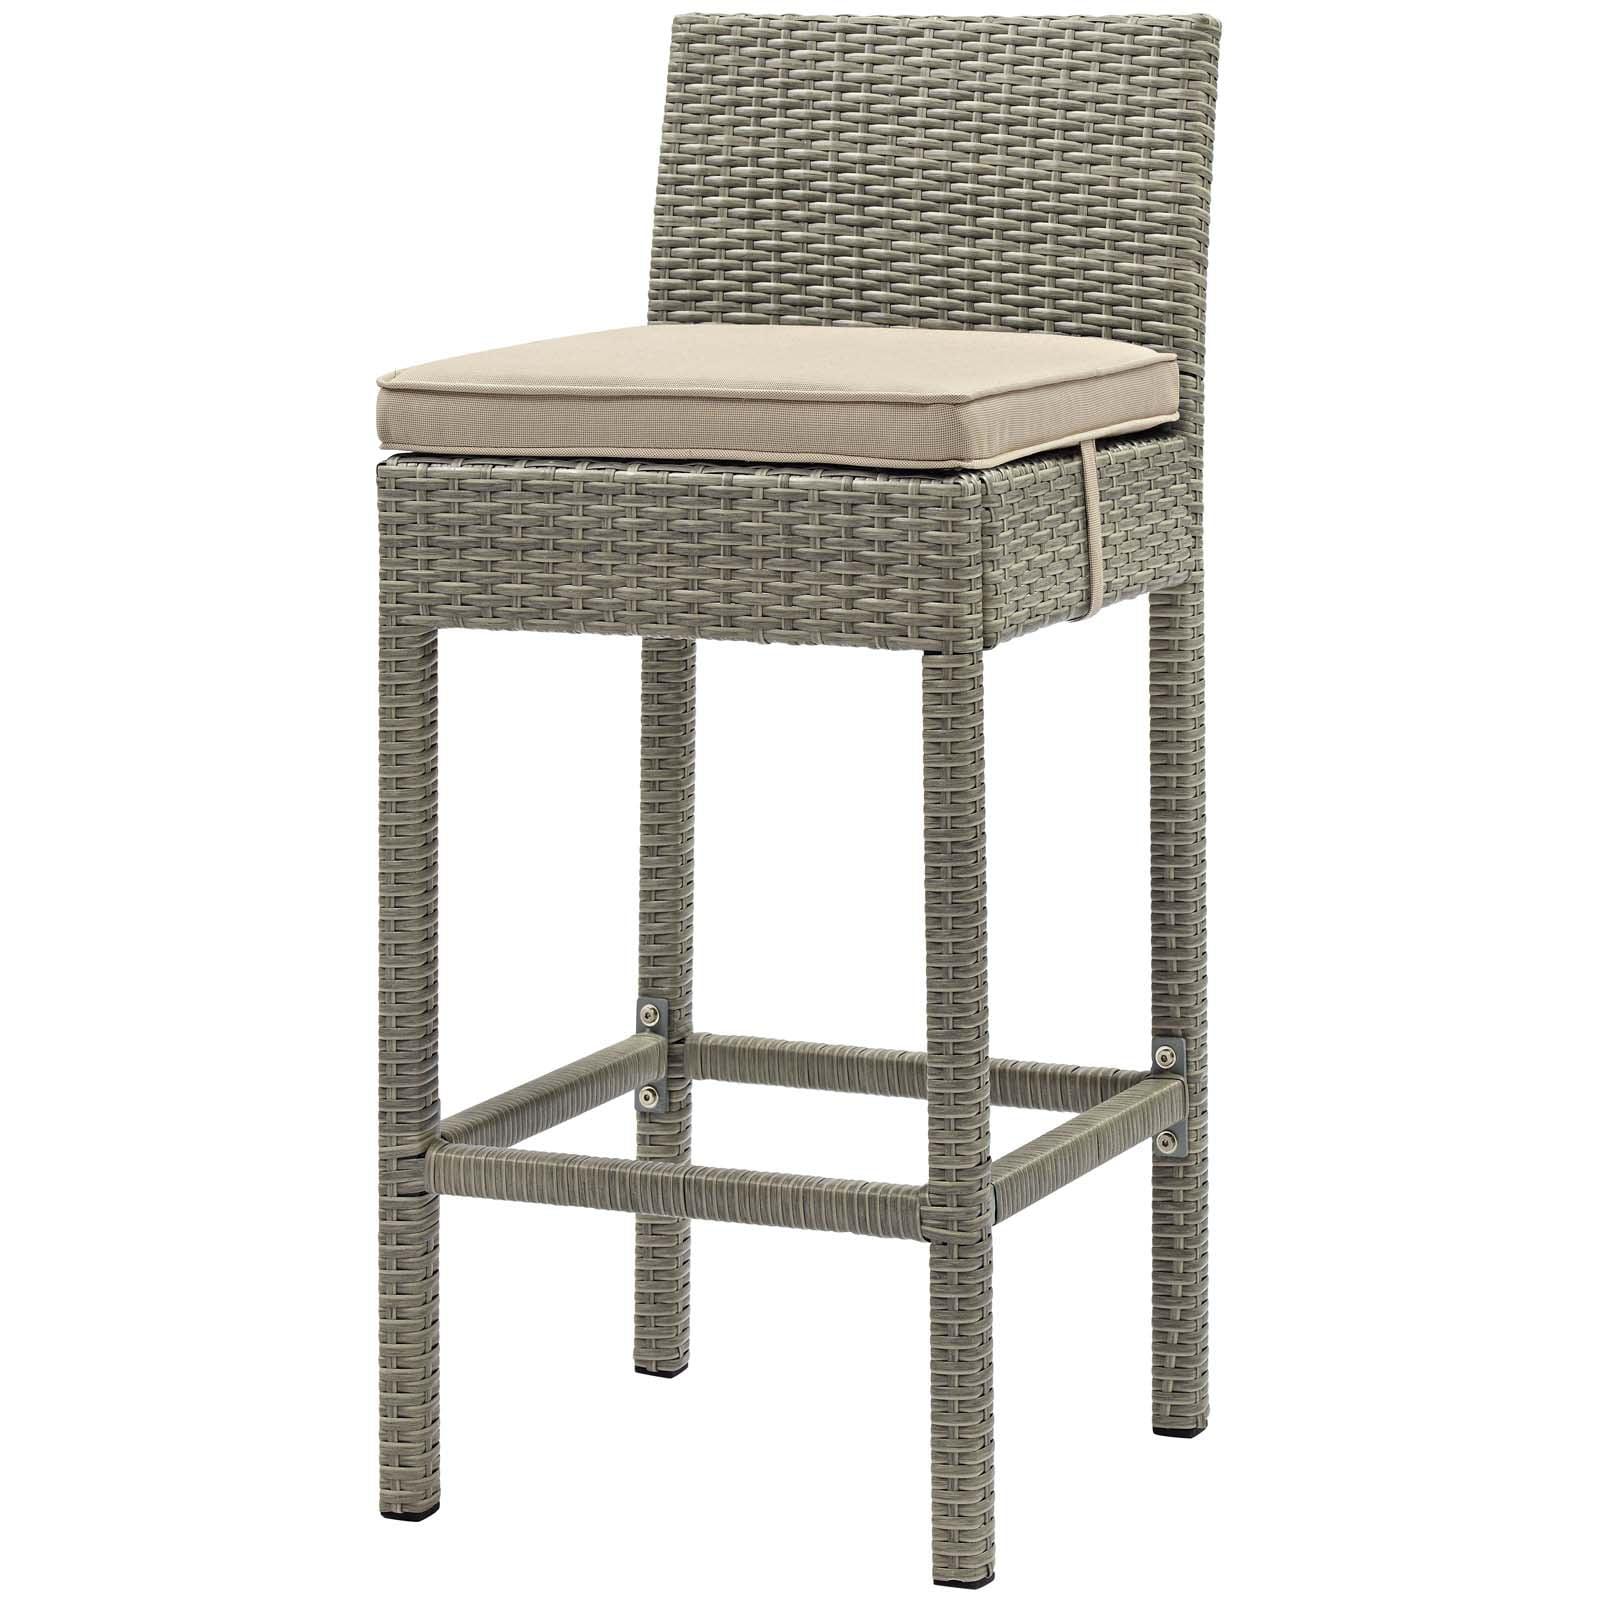 Modern Contemporary Urban Design Outdoor Patio Balcony Garden Furniture Bar Side Stool Chair, Rattan Wicker, Light Gray Beige